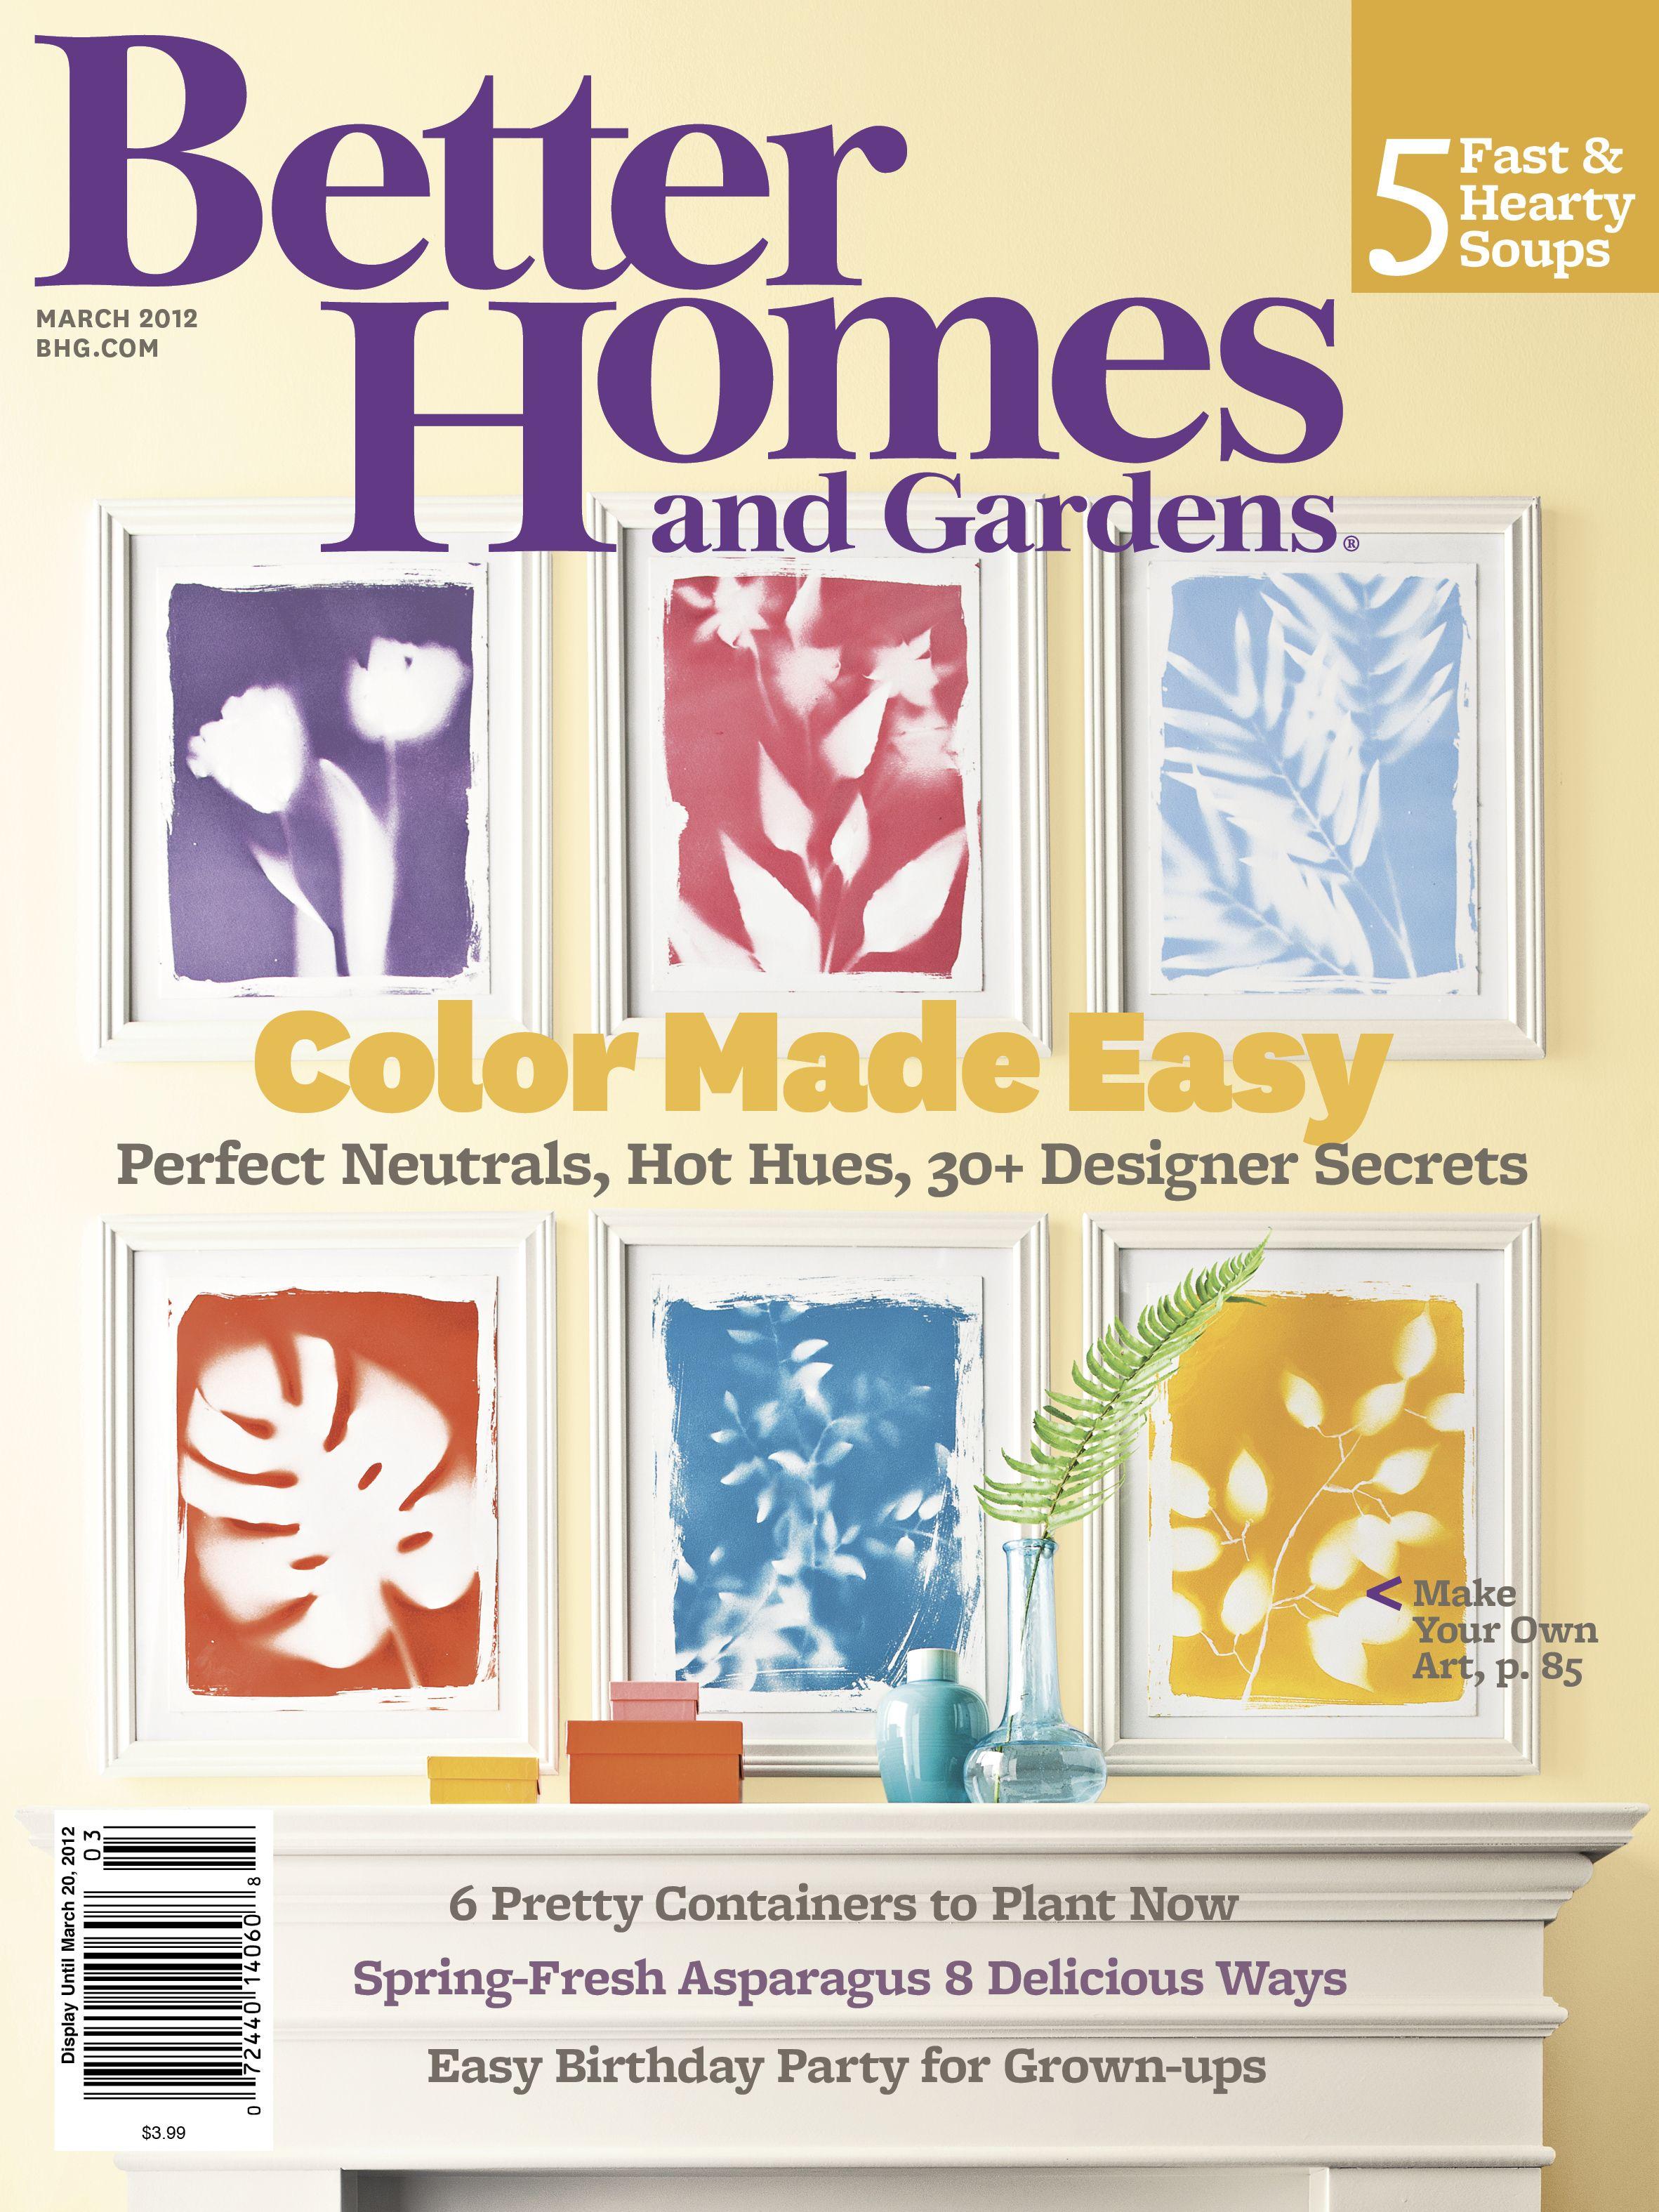 Diy artwork botanical prints diy artwork march and bright diy artwork botanical prints solutioingenieria Image collections